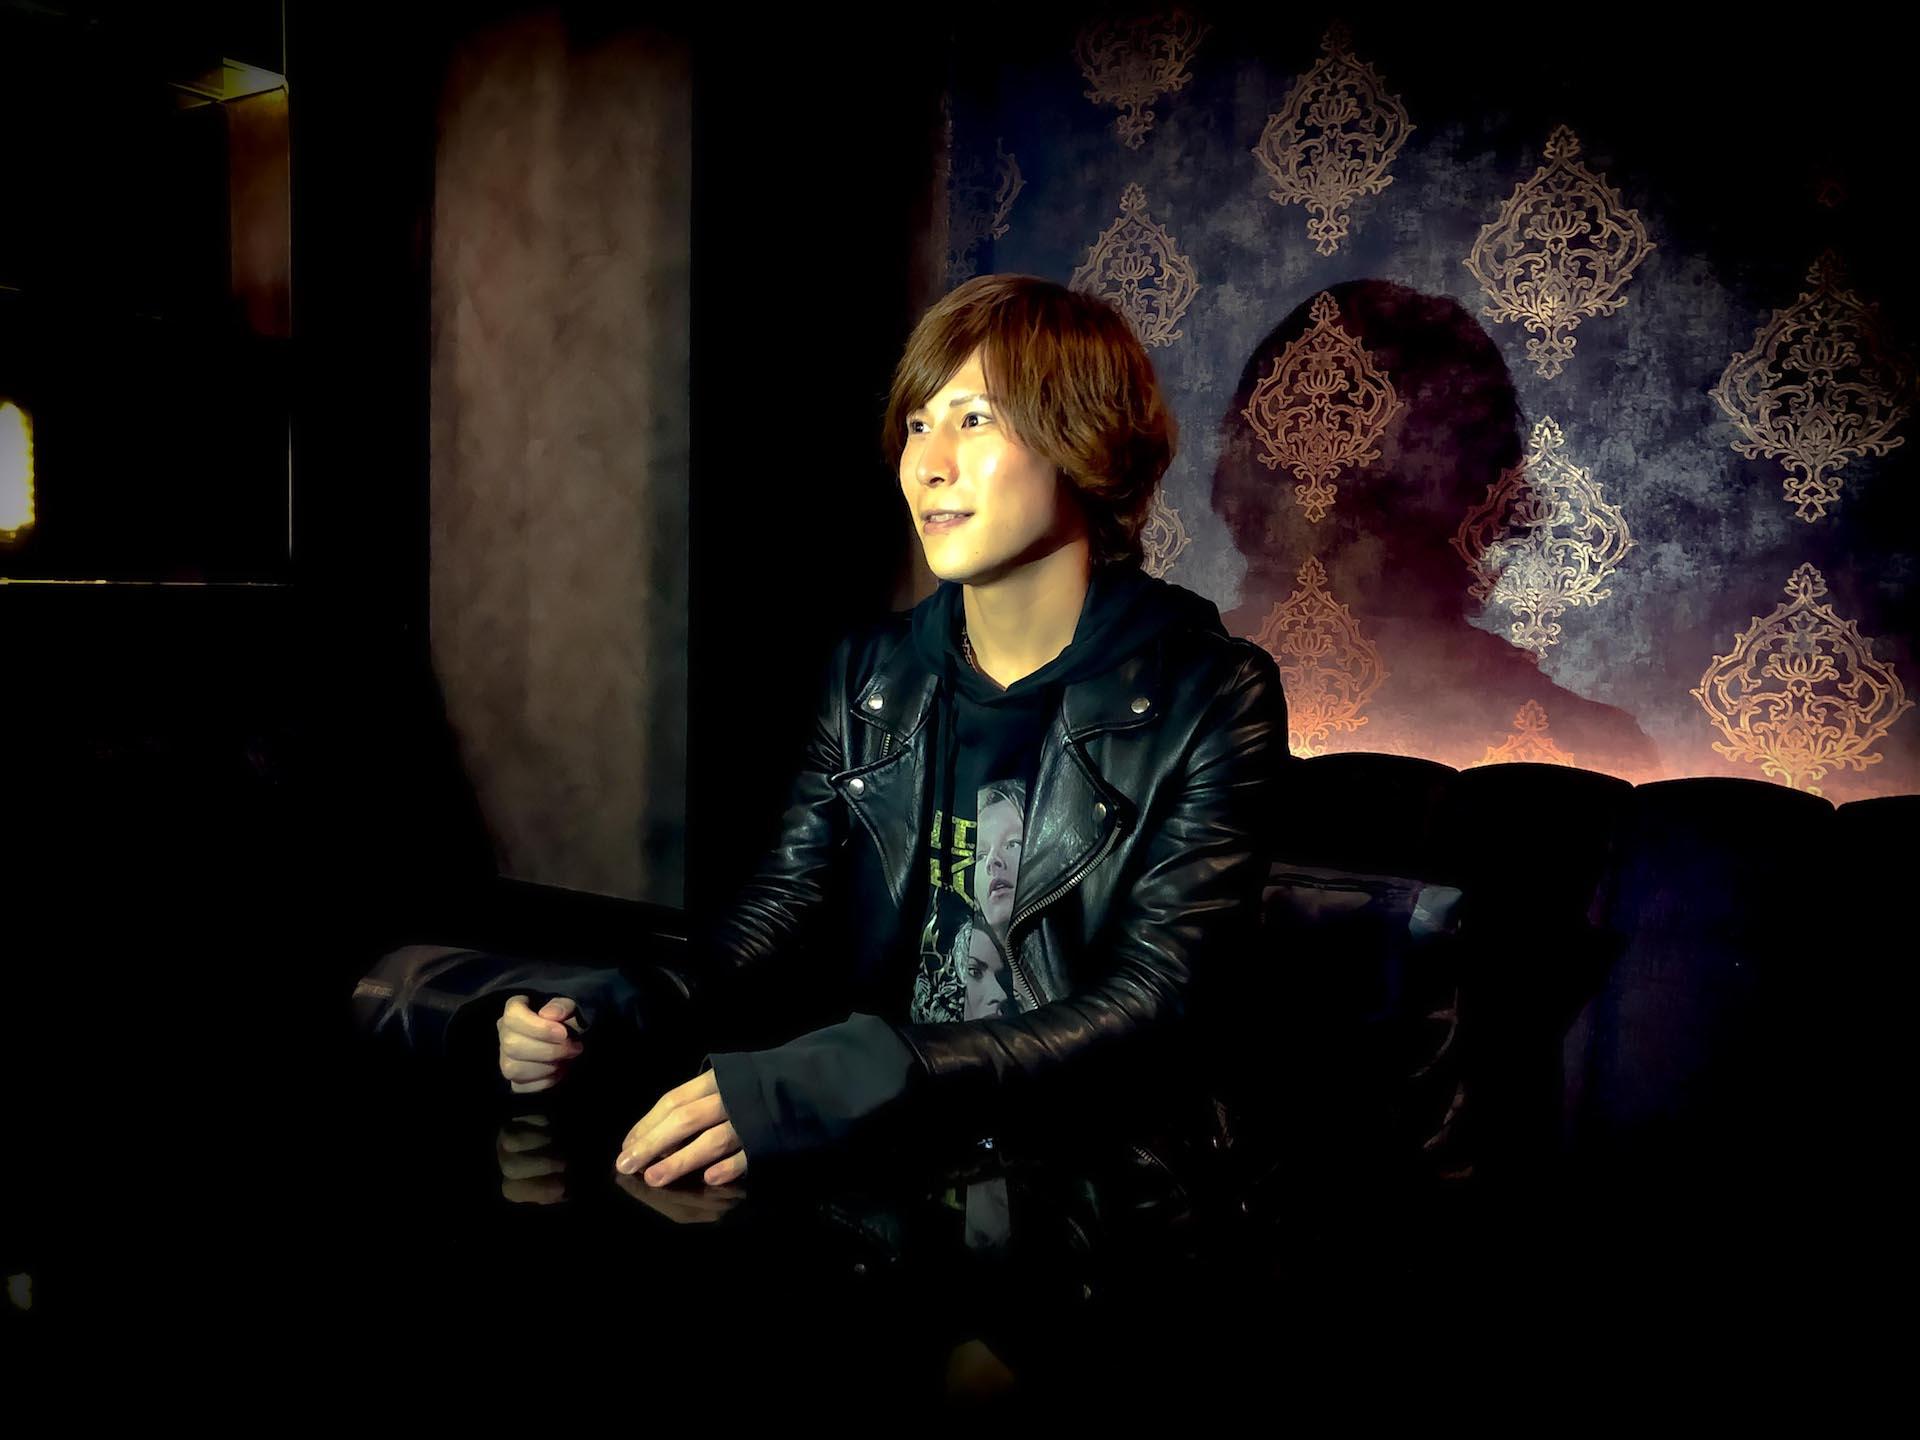 【Chloe】代表取締役 星咲五奏さんにインタビュー!歌舞伎町と地方におけるホストクラブの違い